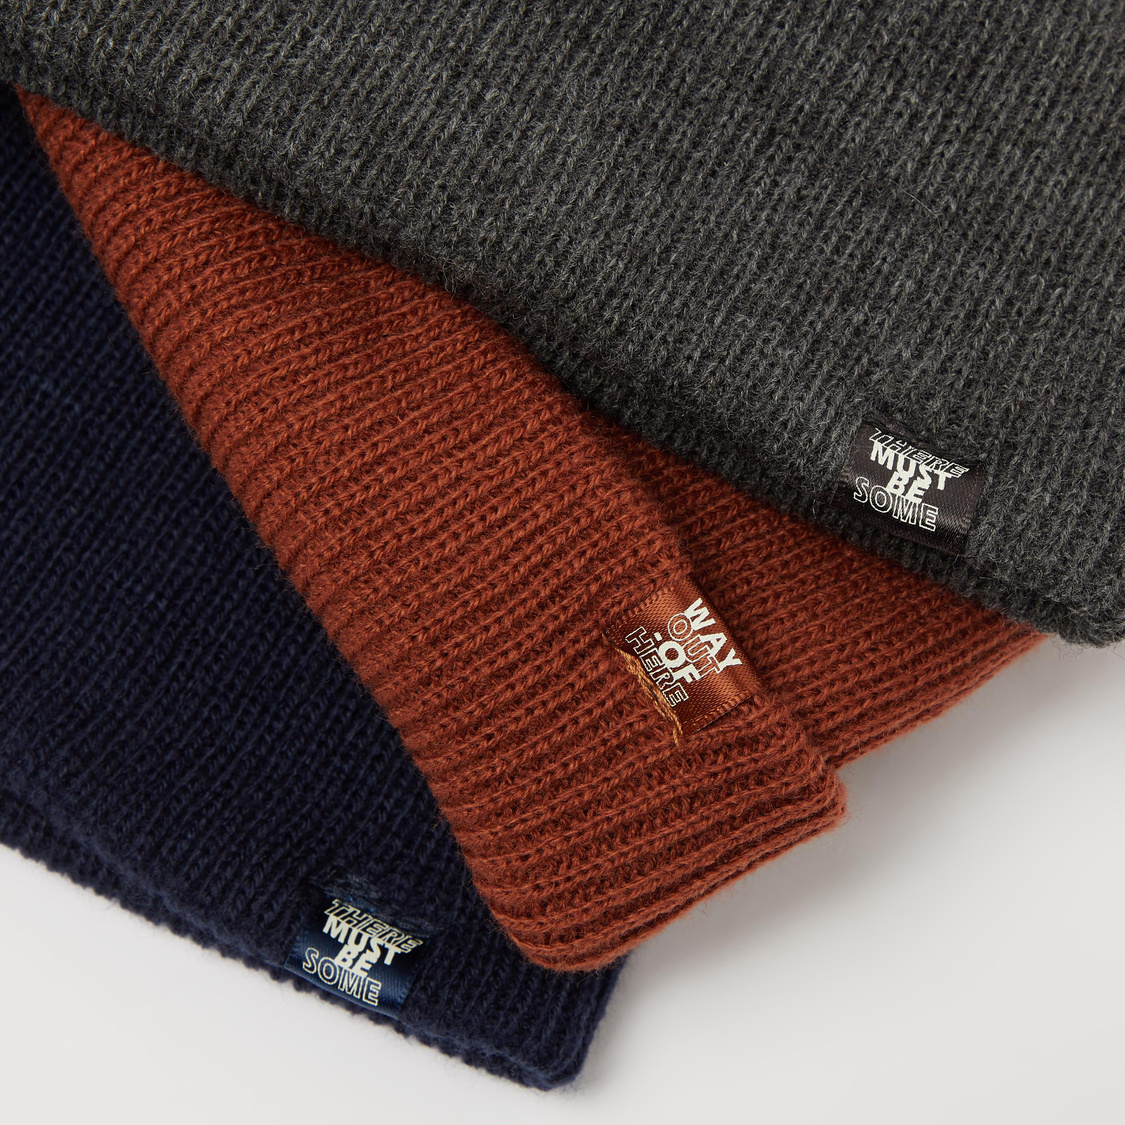 Set of 3 - Textured Beanie Caps